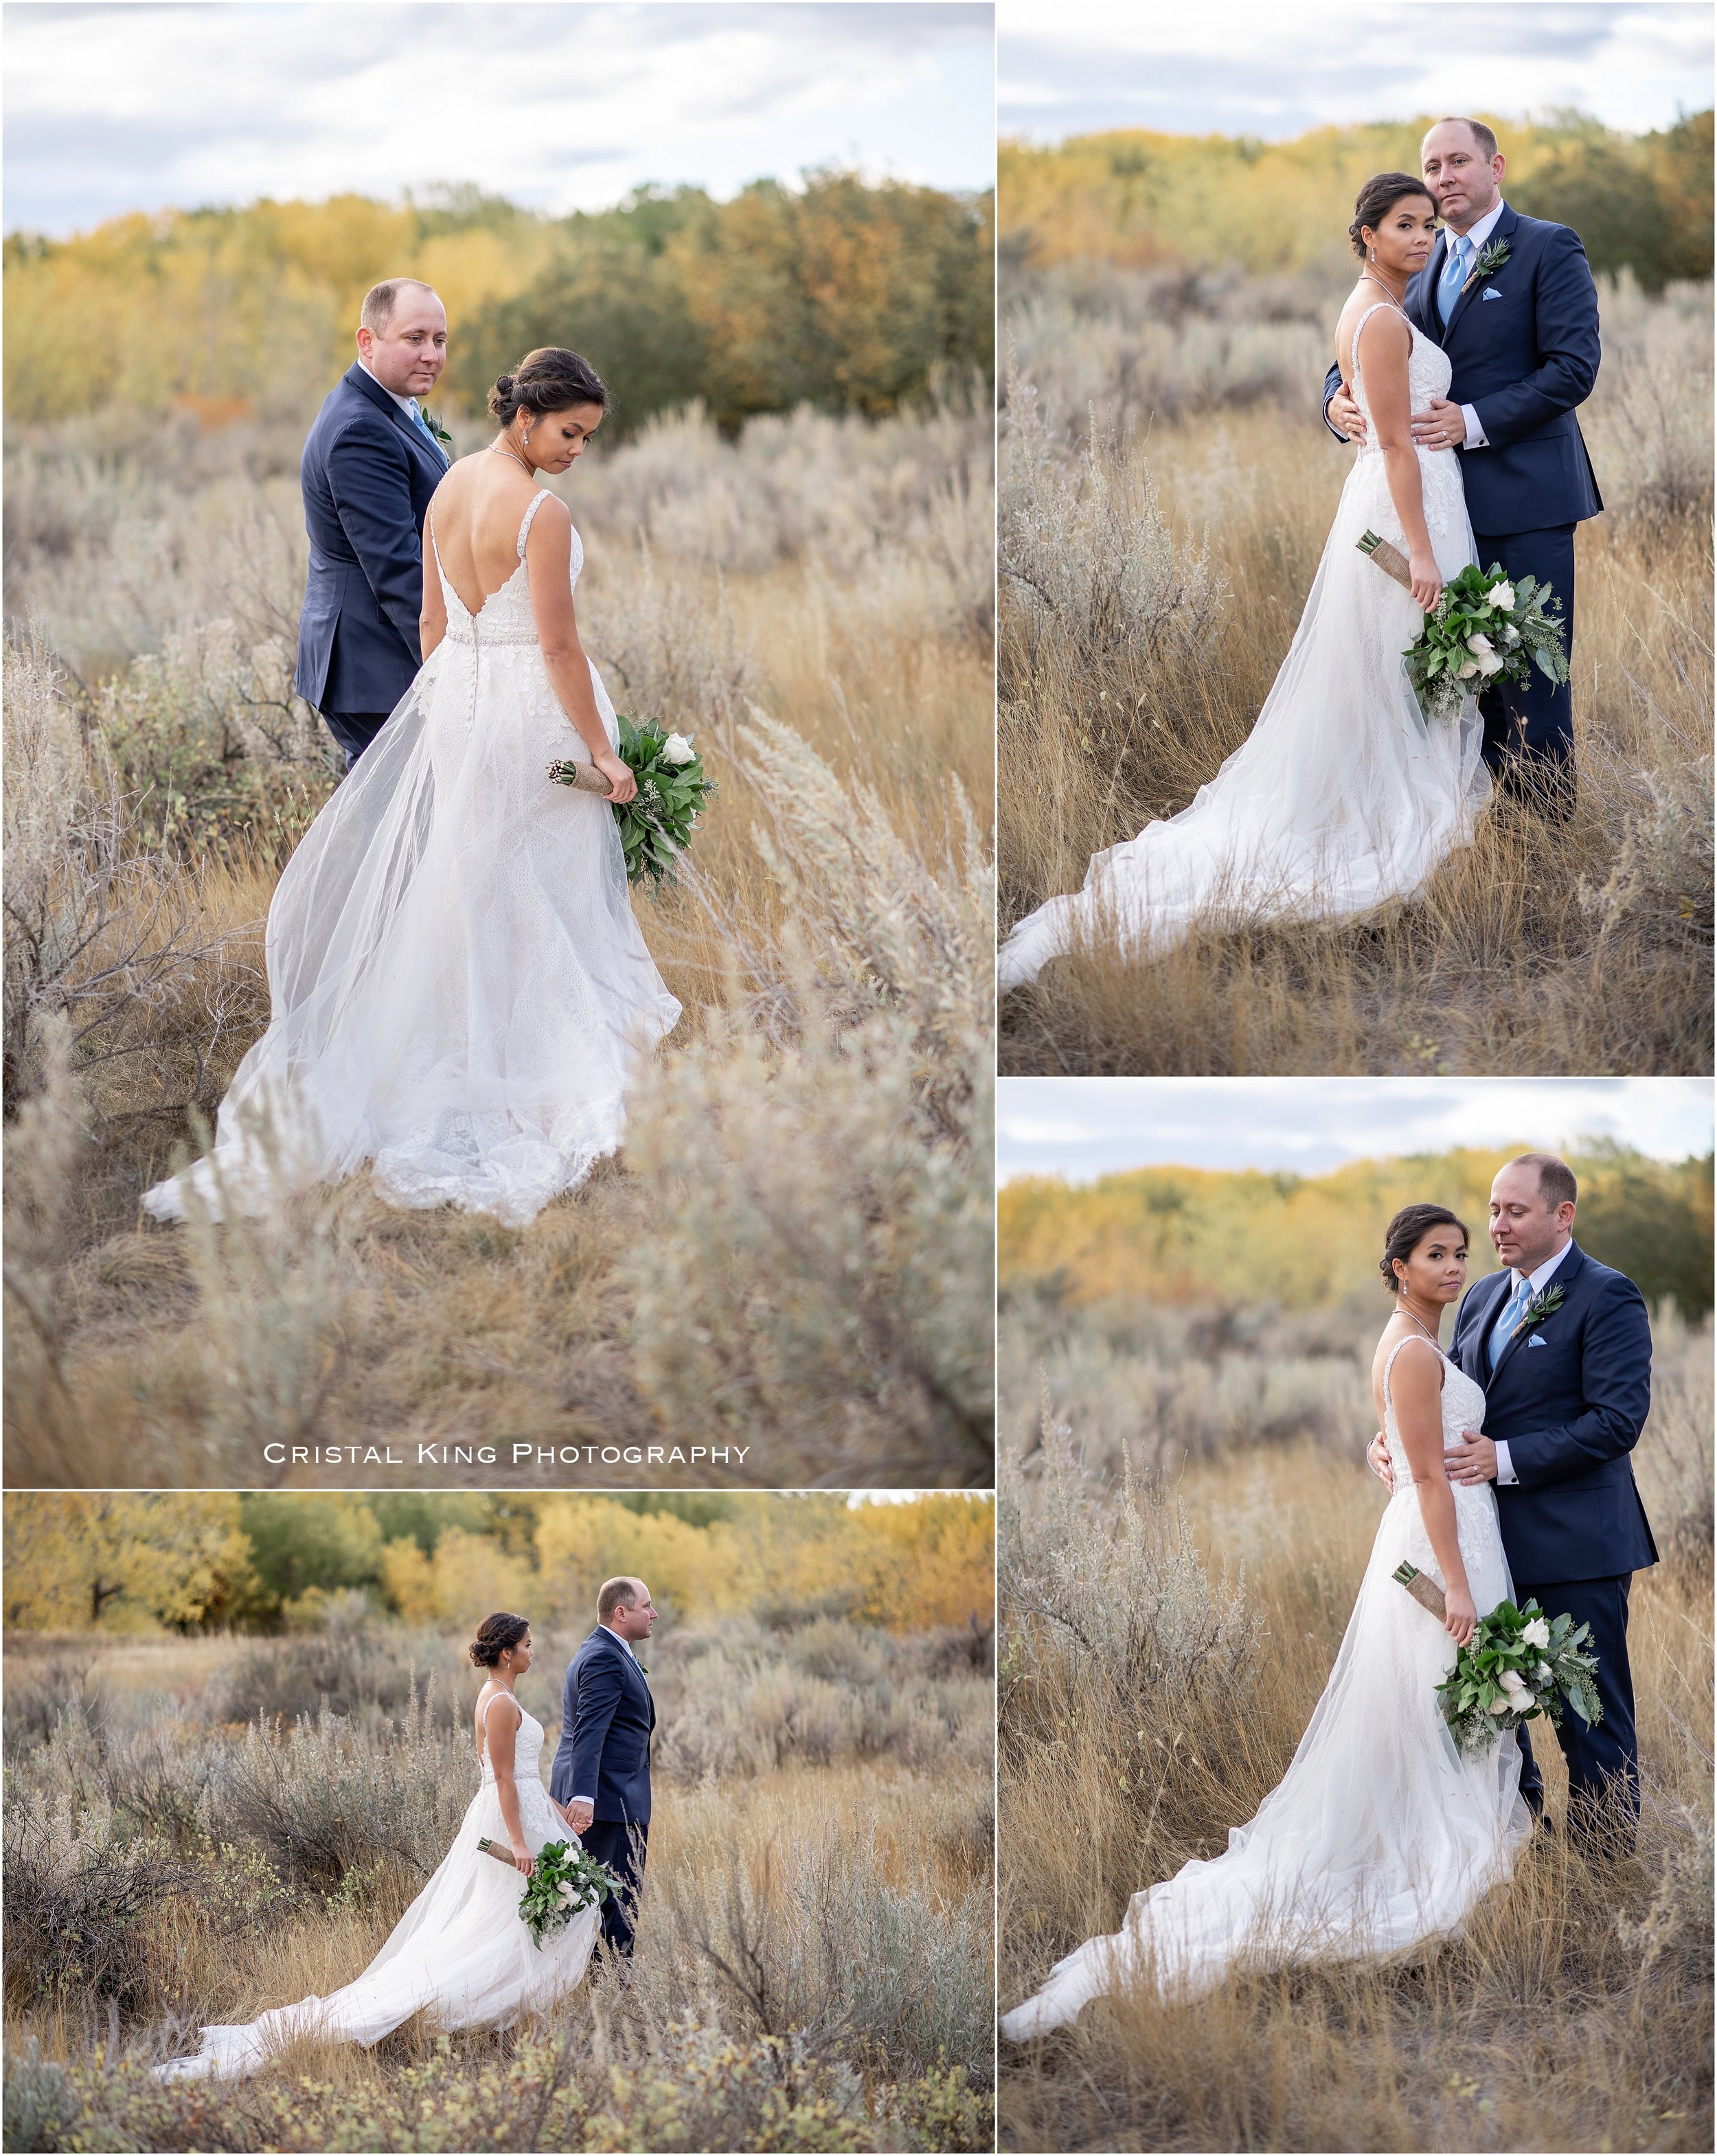 Quynh-Scotts-Wedding-80.jpg